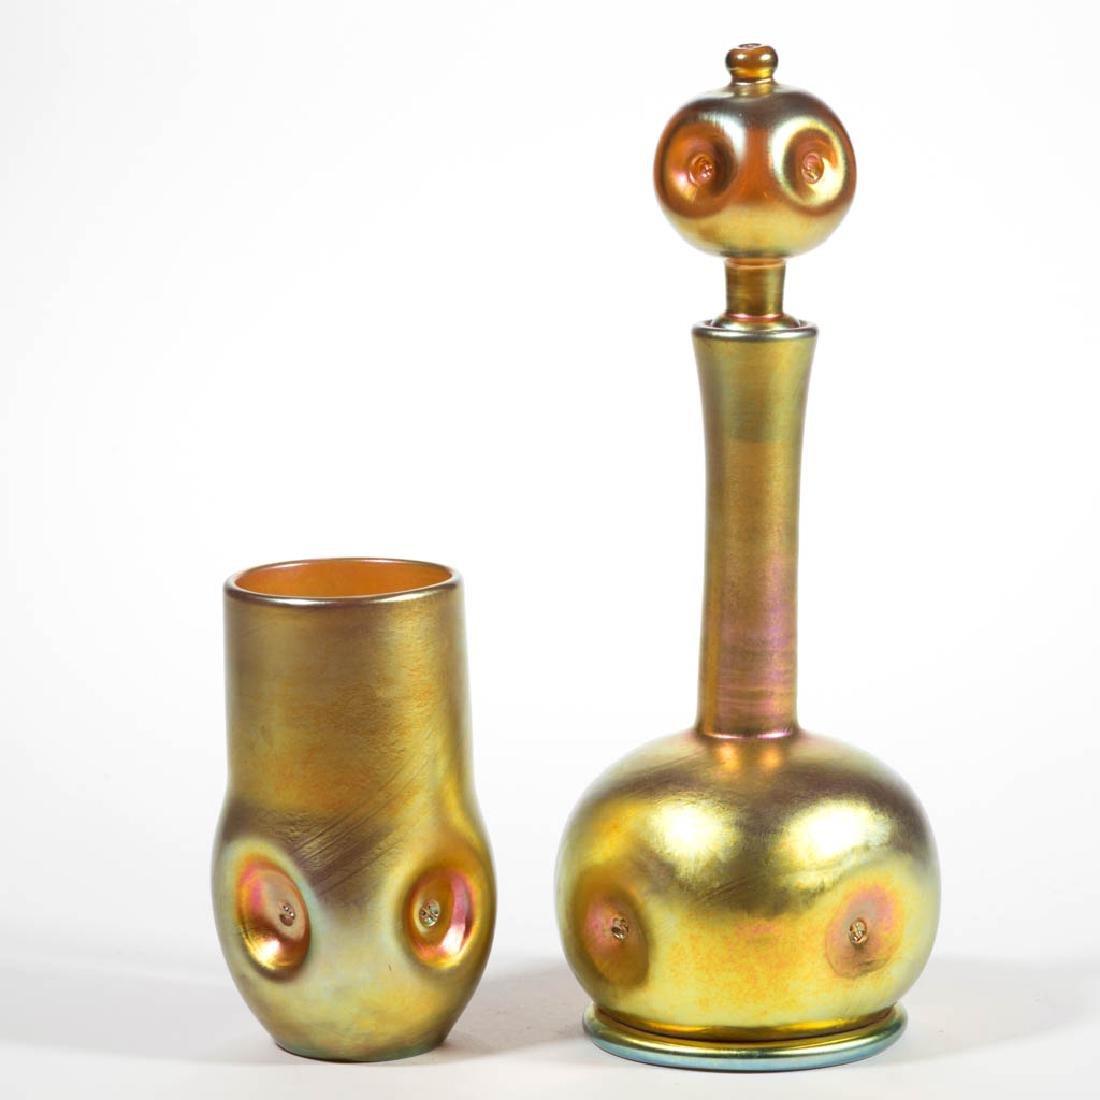 LUNDBERG STUDIOS GOLDEN IRIDESCENT ART GLASS DRINKING